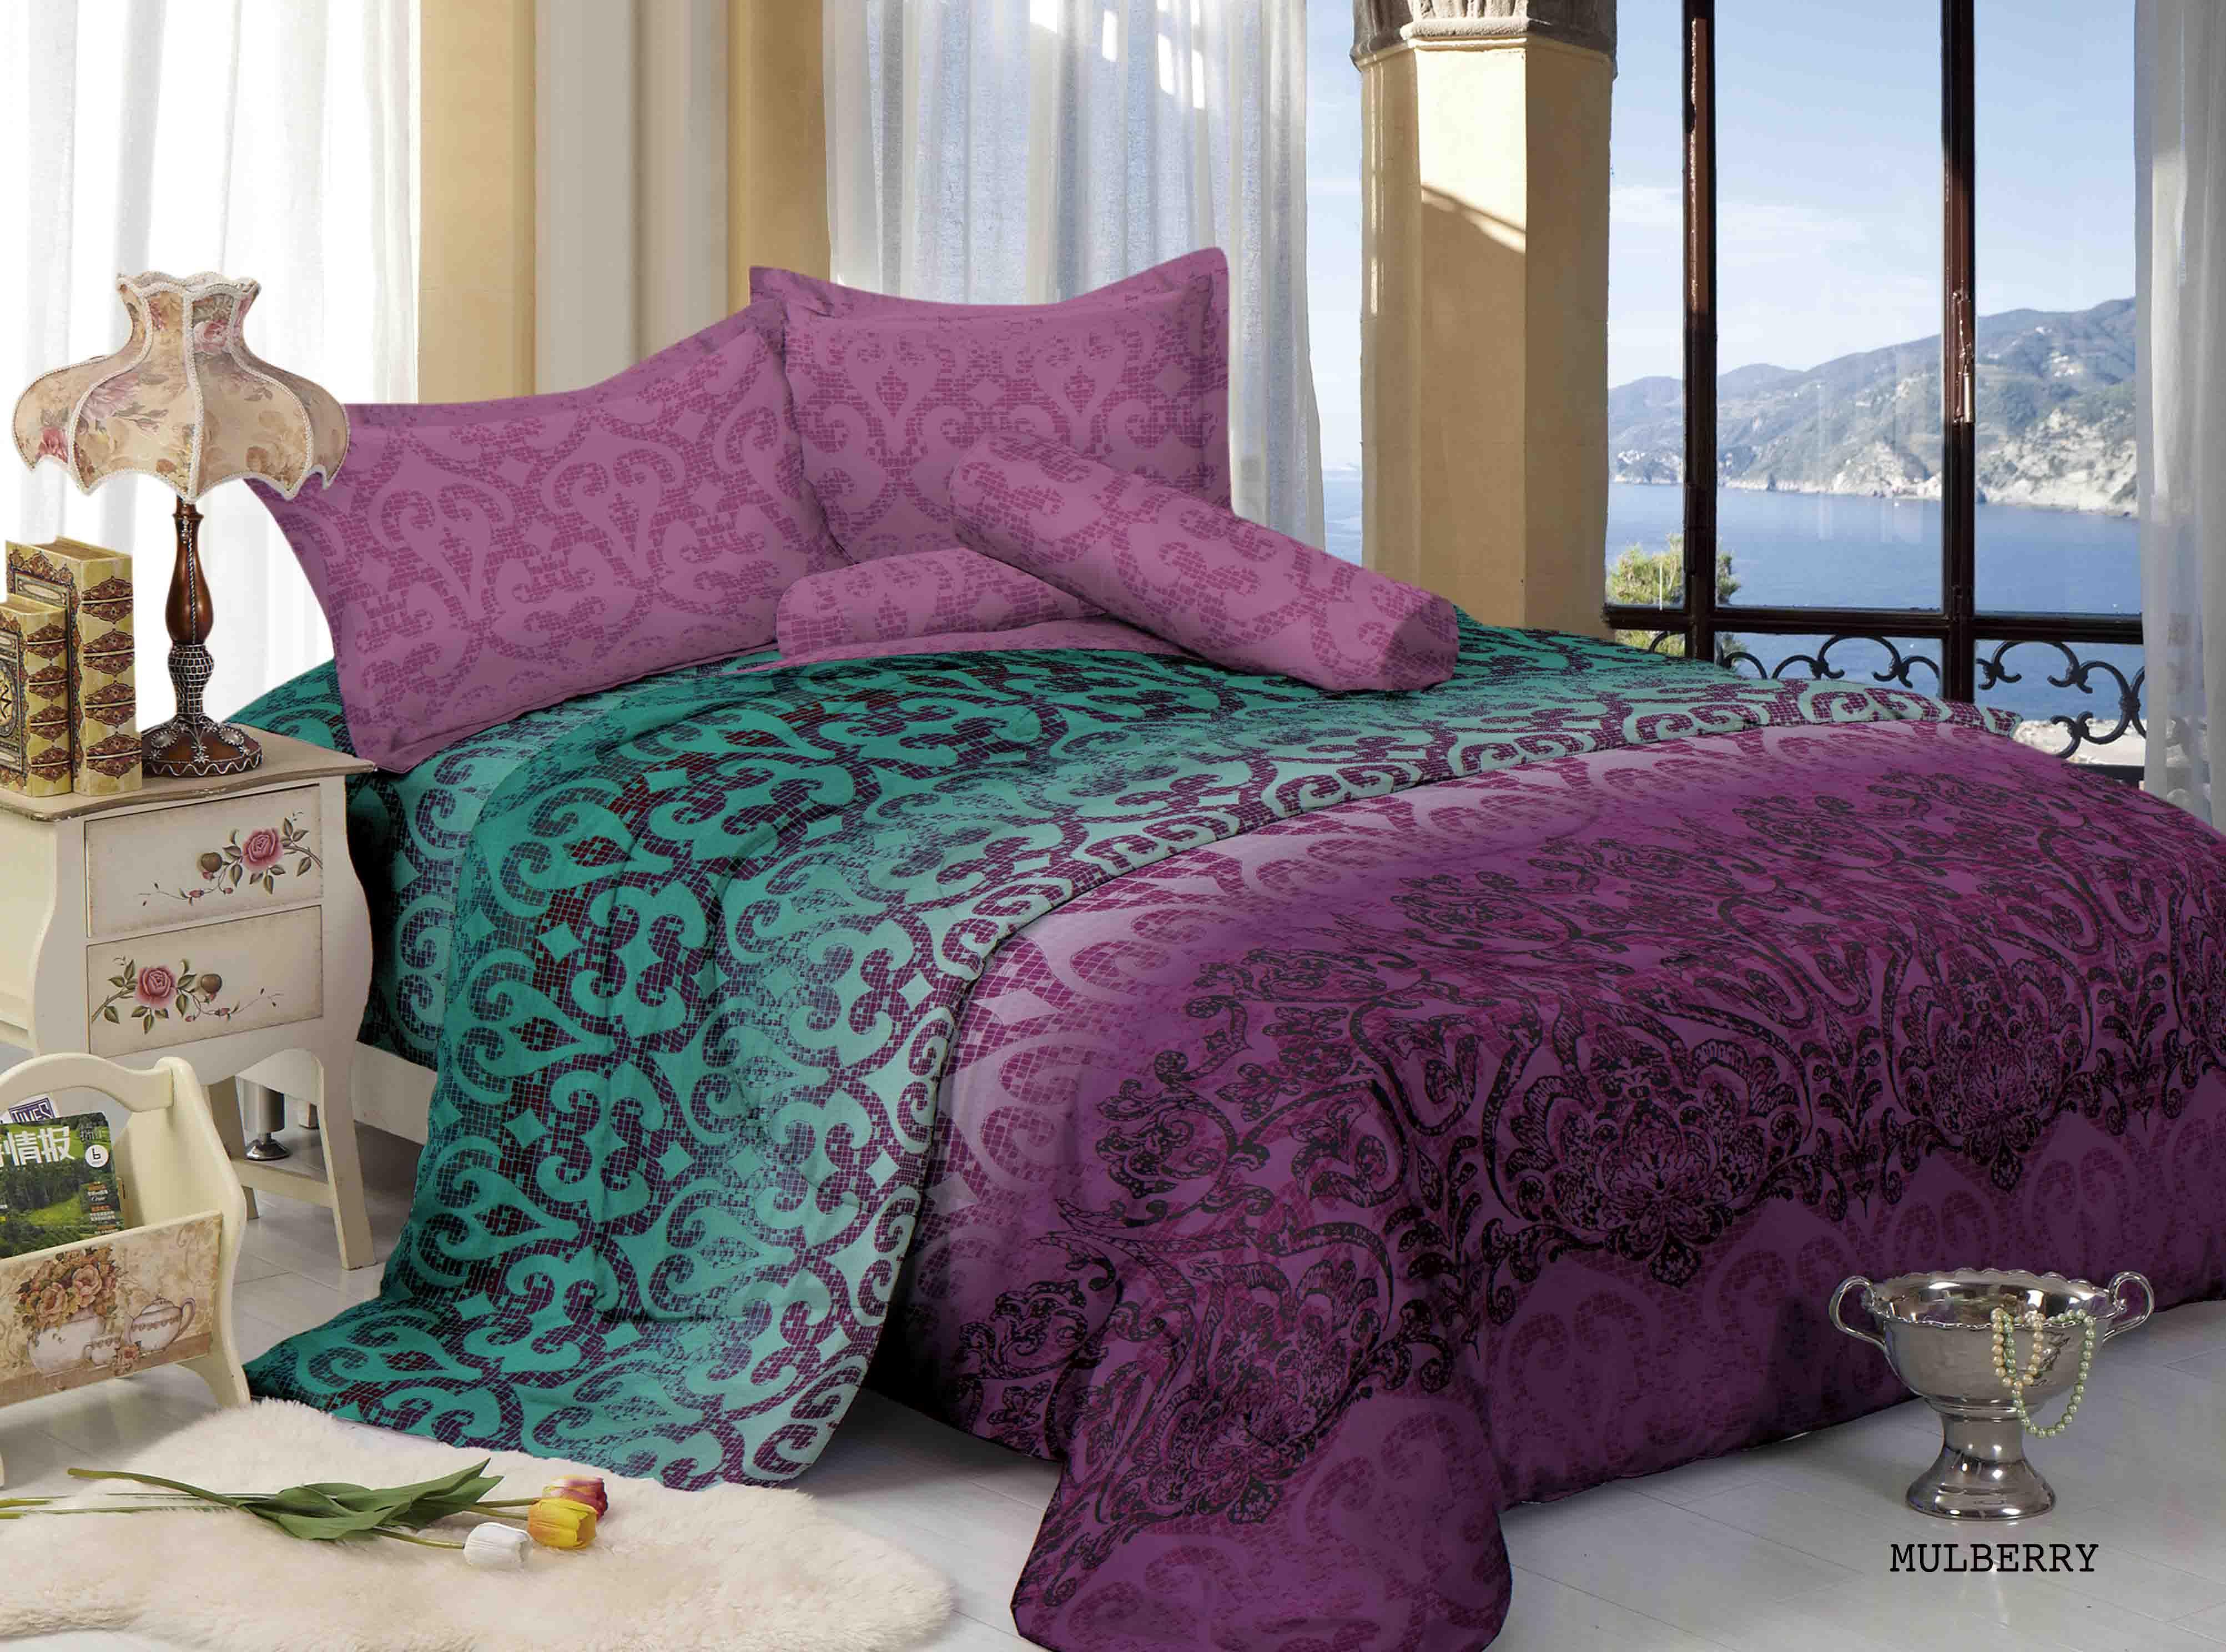 Mulbery Design Abstract Yan Gmemiliki Kombinasi Warna Yang  # Muebles Nay Tigre